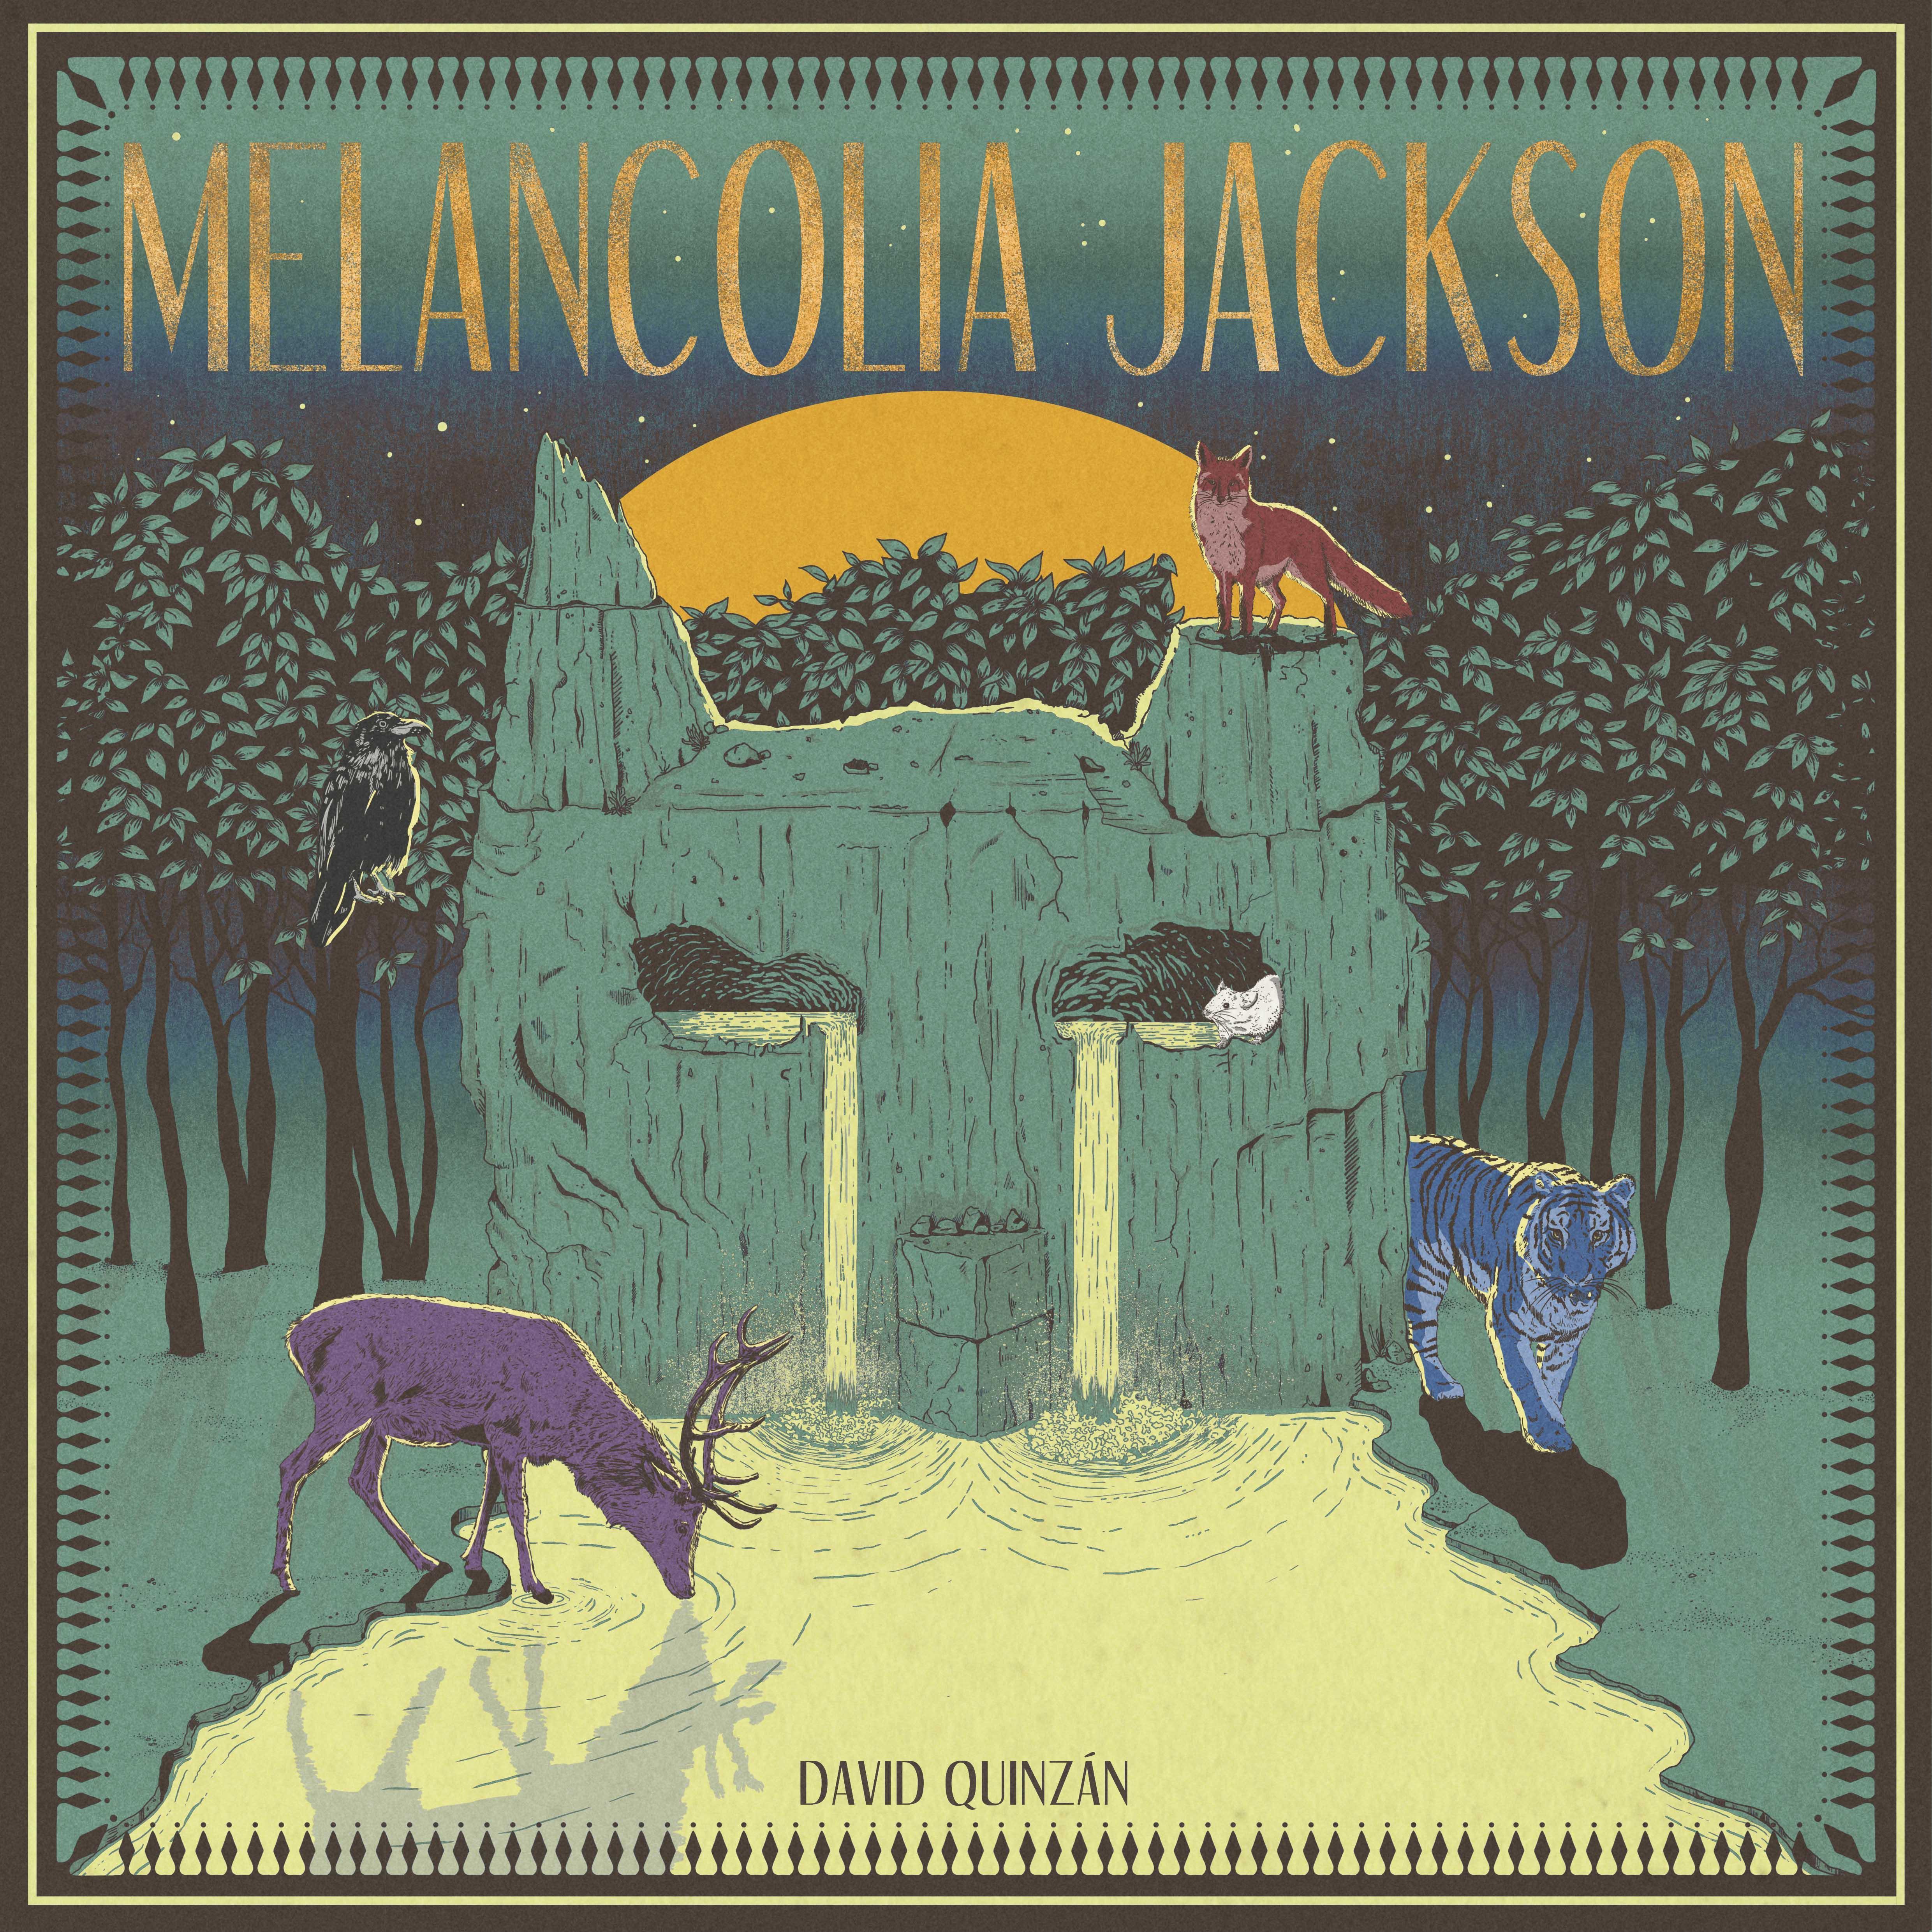 Melancolía Jackson